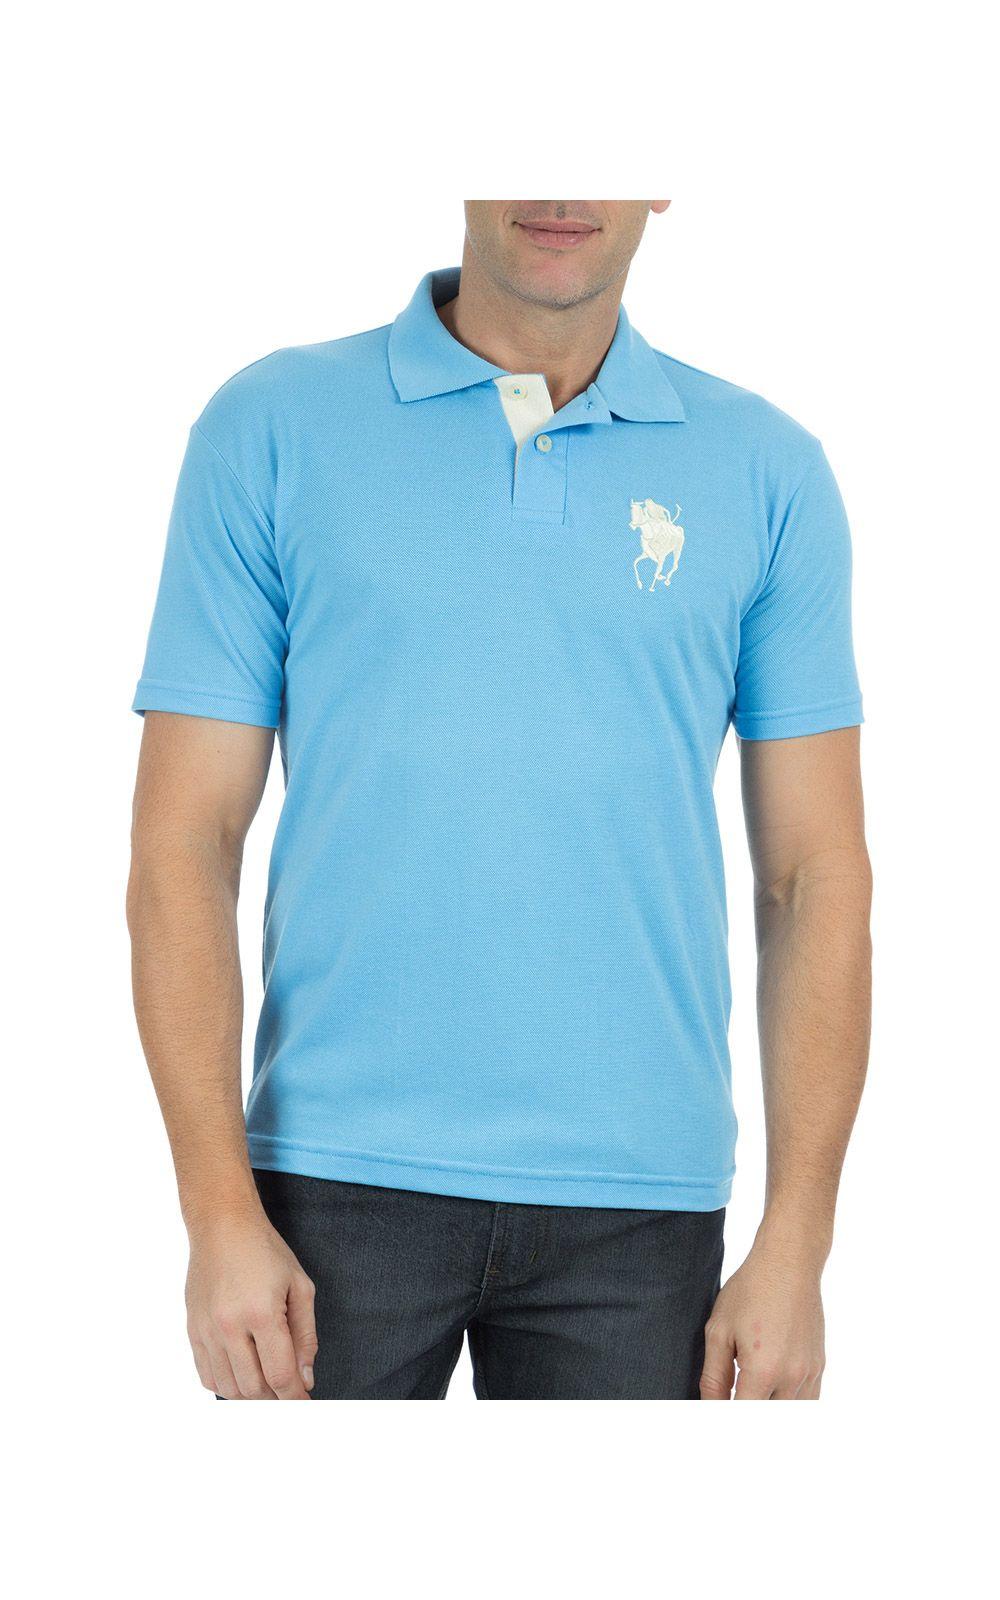 Foto 1 - Camisa Polo Masculina Azul Claro Bordada